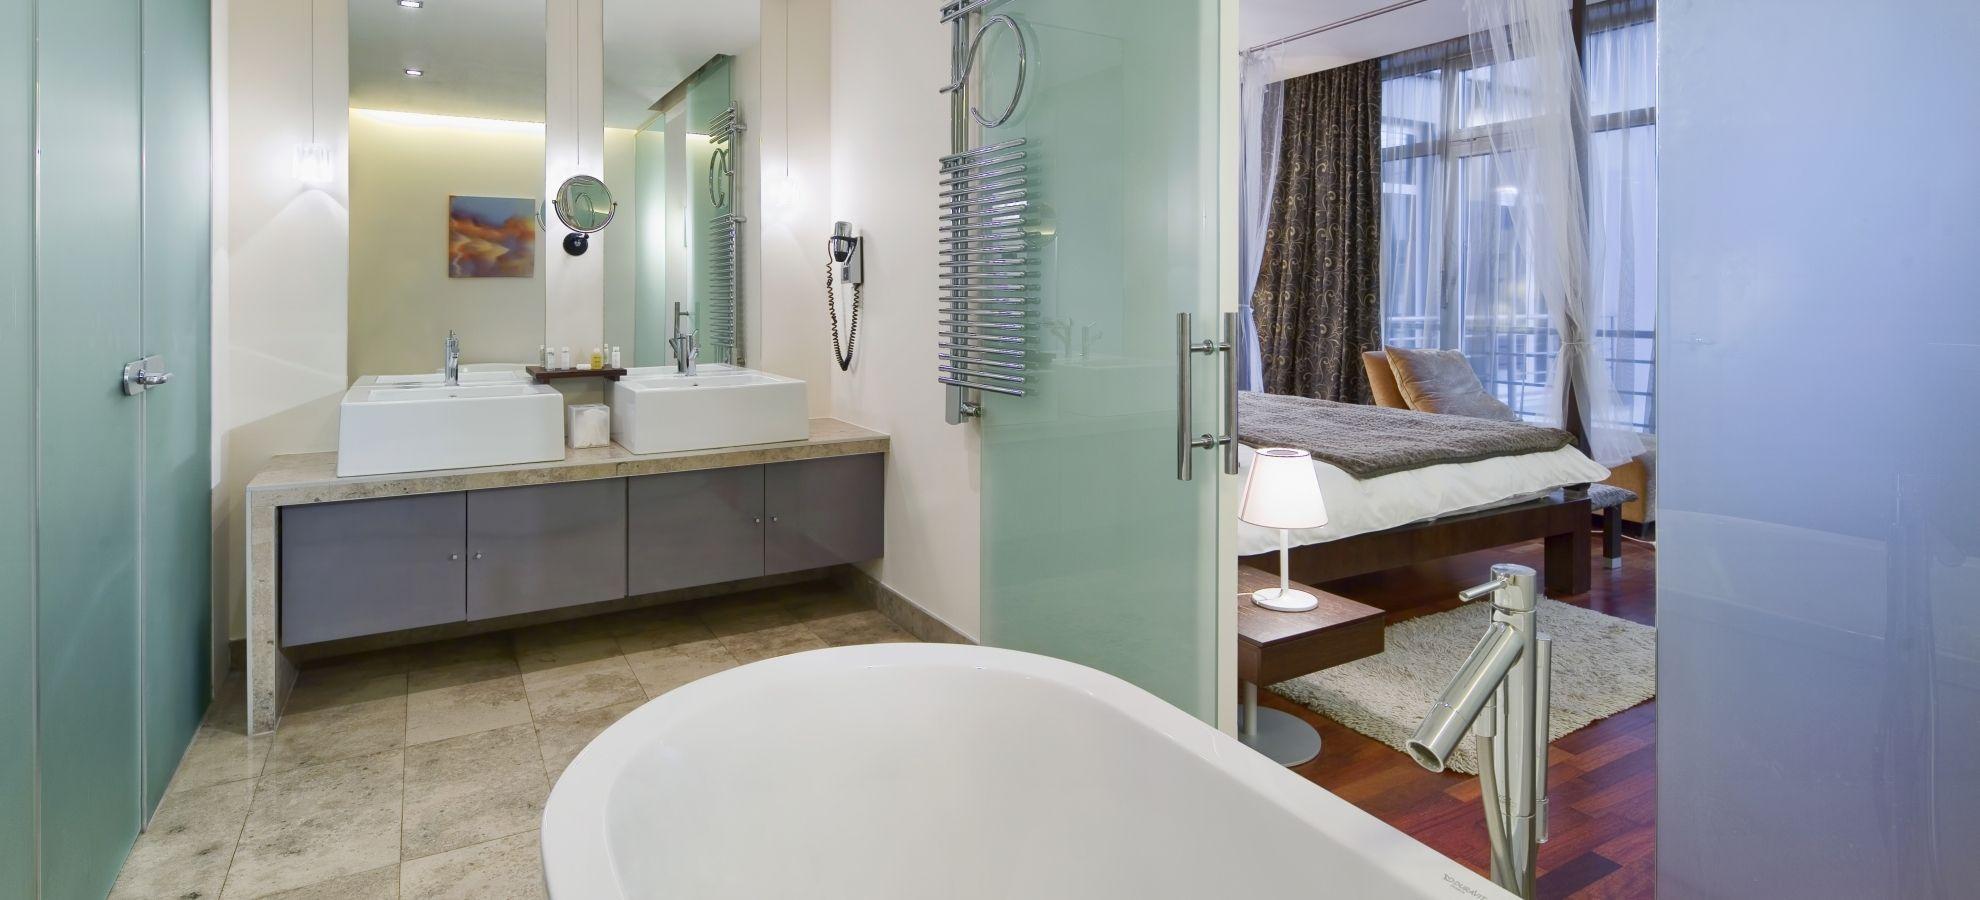 Mamaison-Hotel-Pokrovka-Moscow-Presidential-Suite-Bathroom.jpg